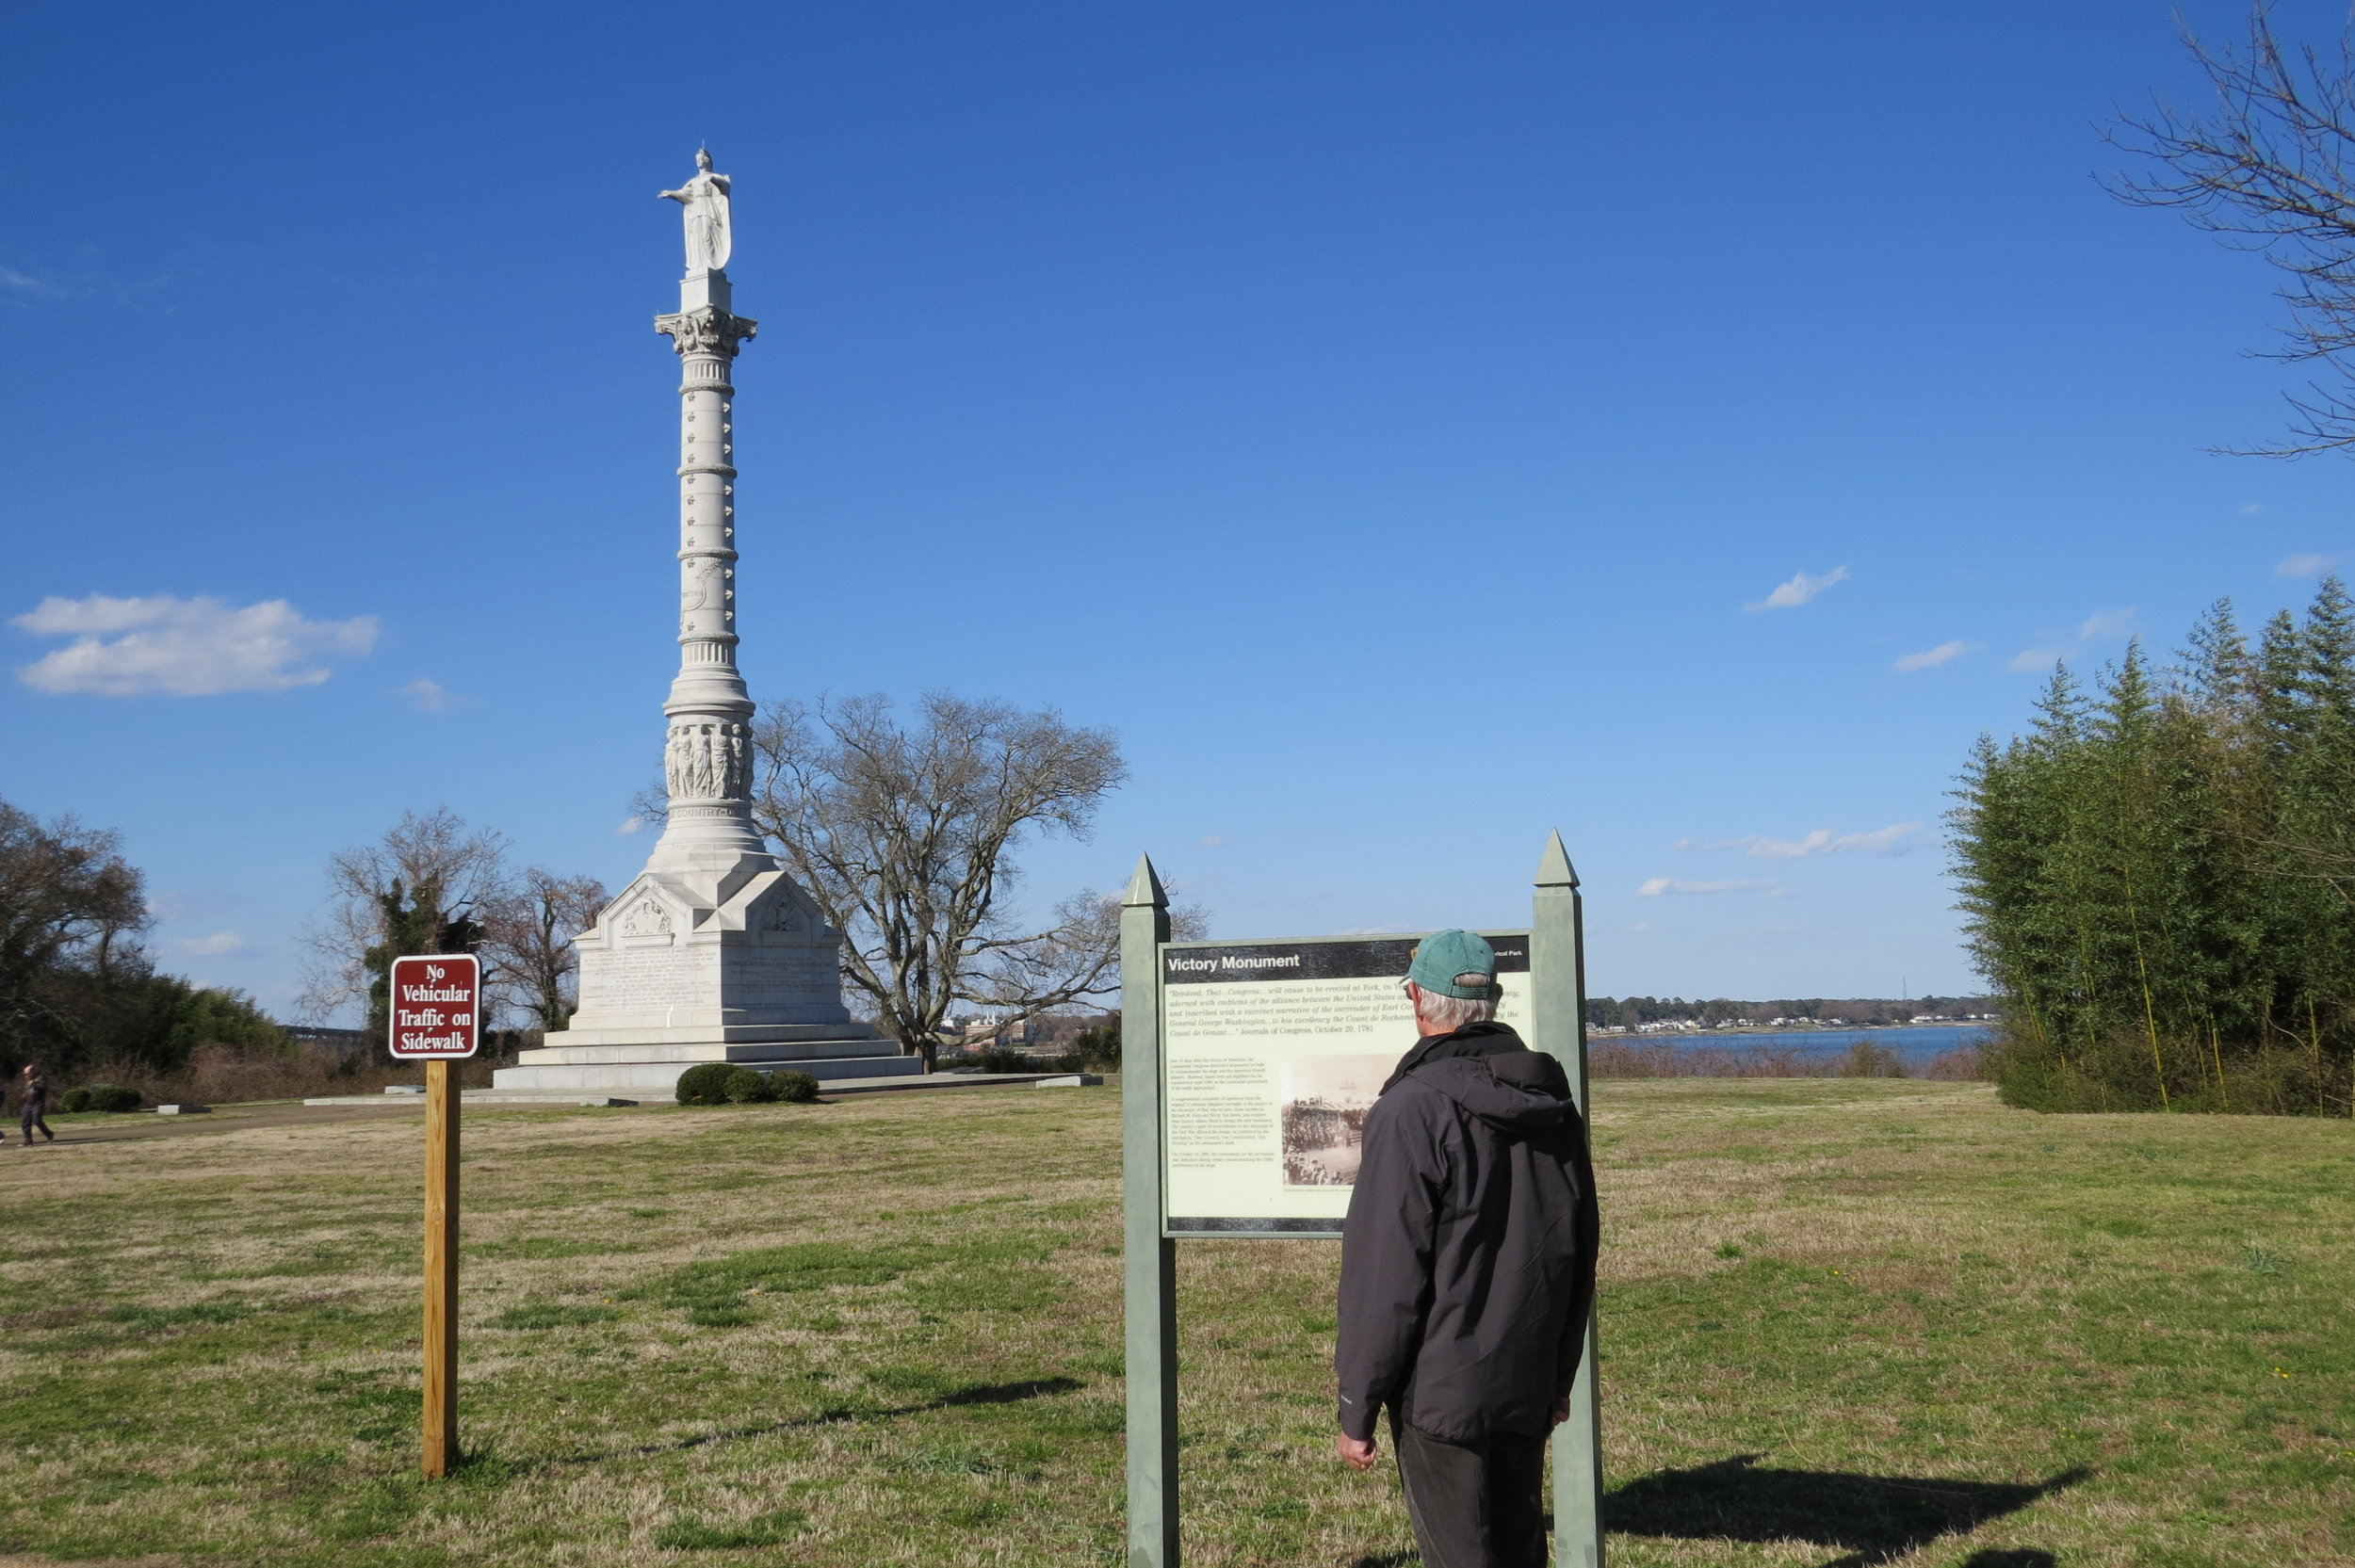 colonial national historical park -   yorktown battlefield   - yorktown, VA - 2017